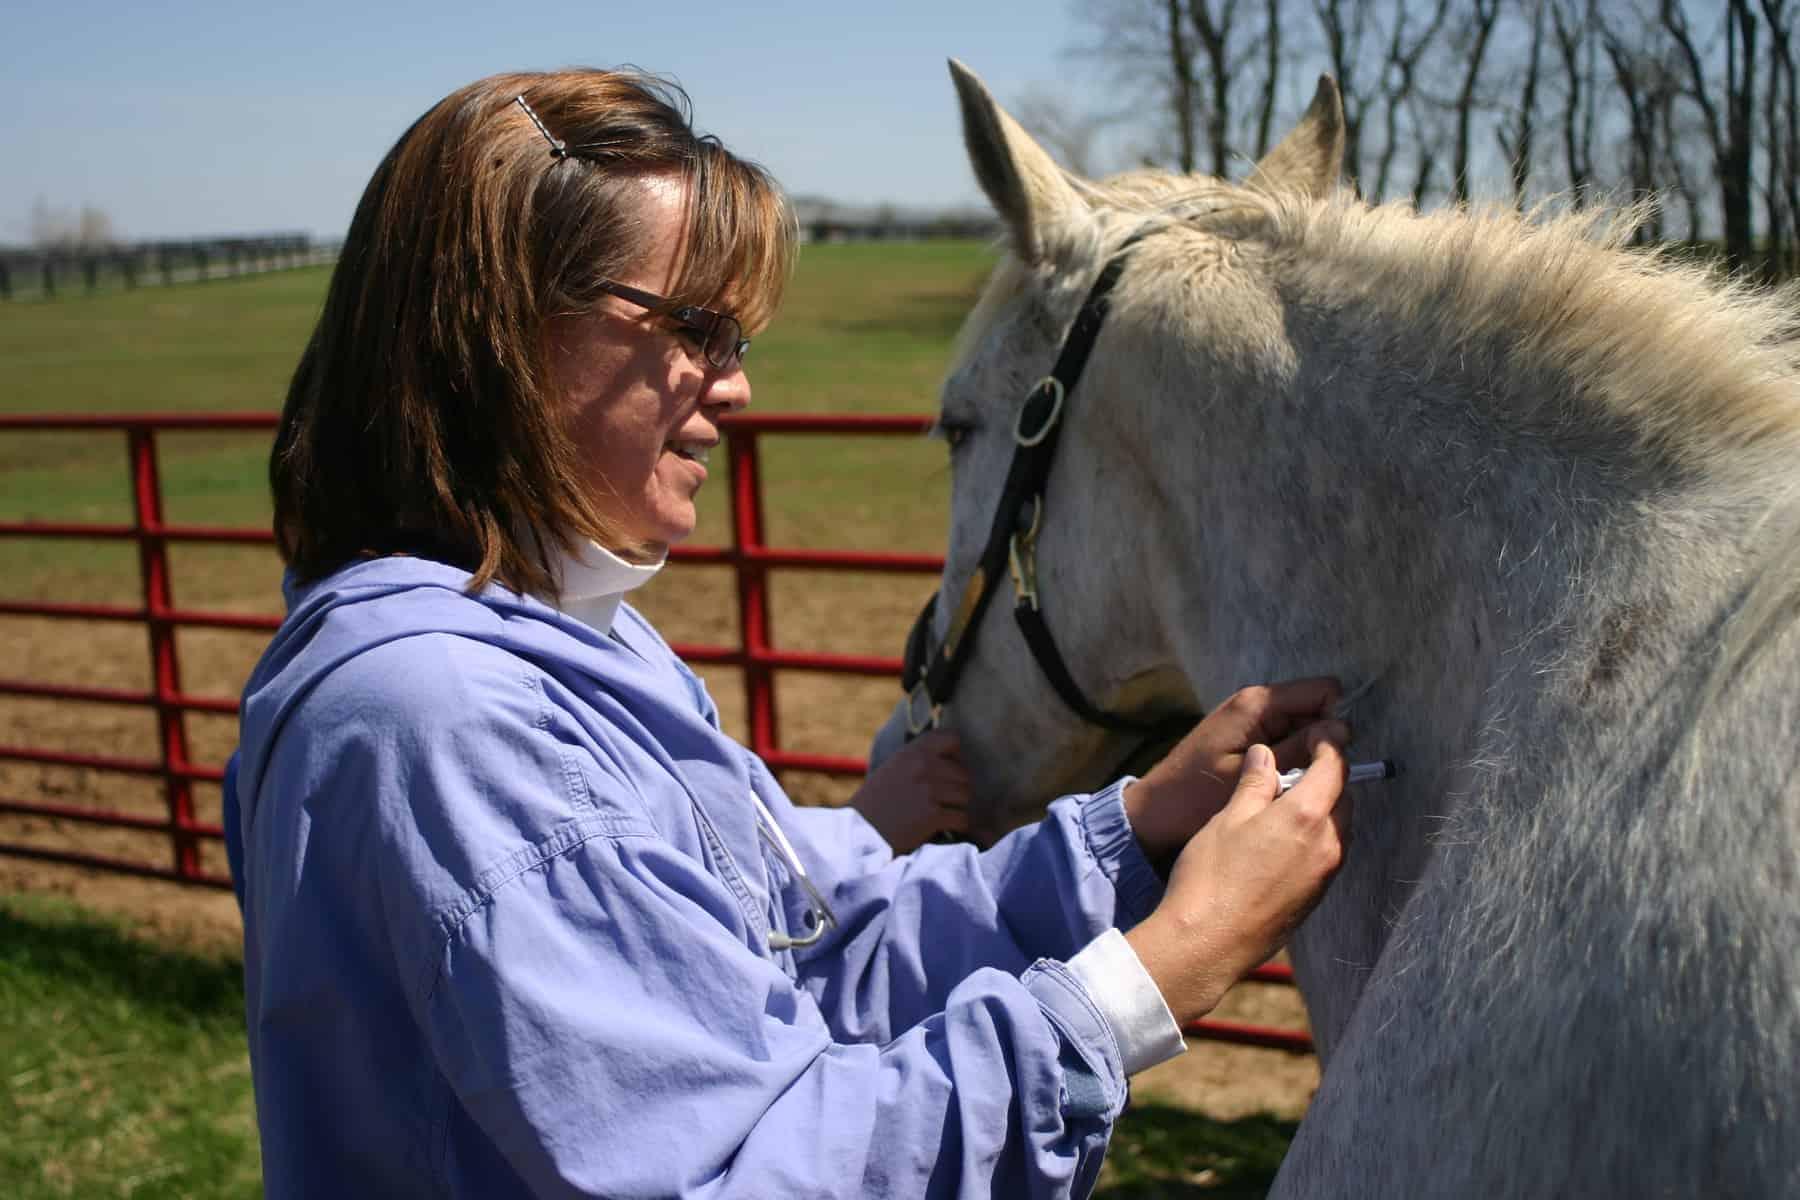 Vet vaccinating older horse